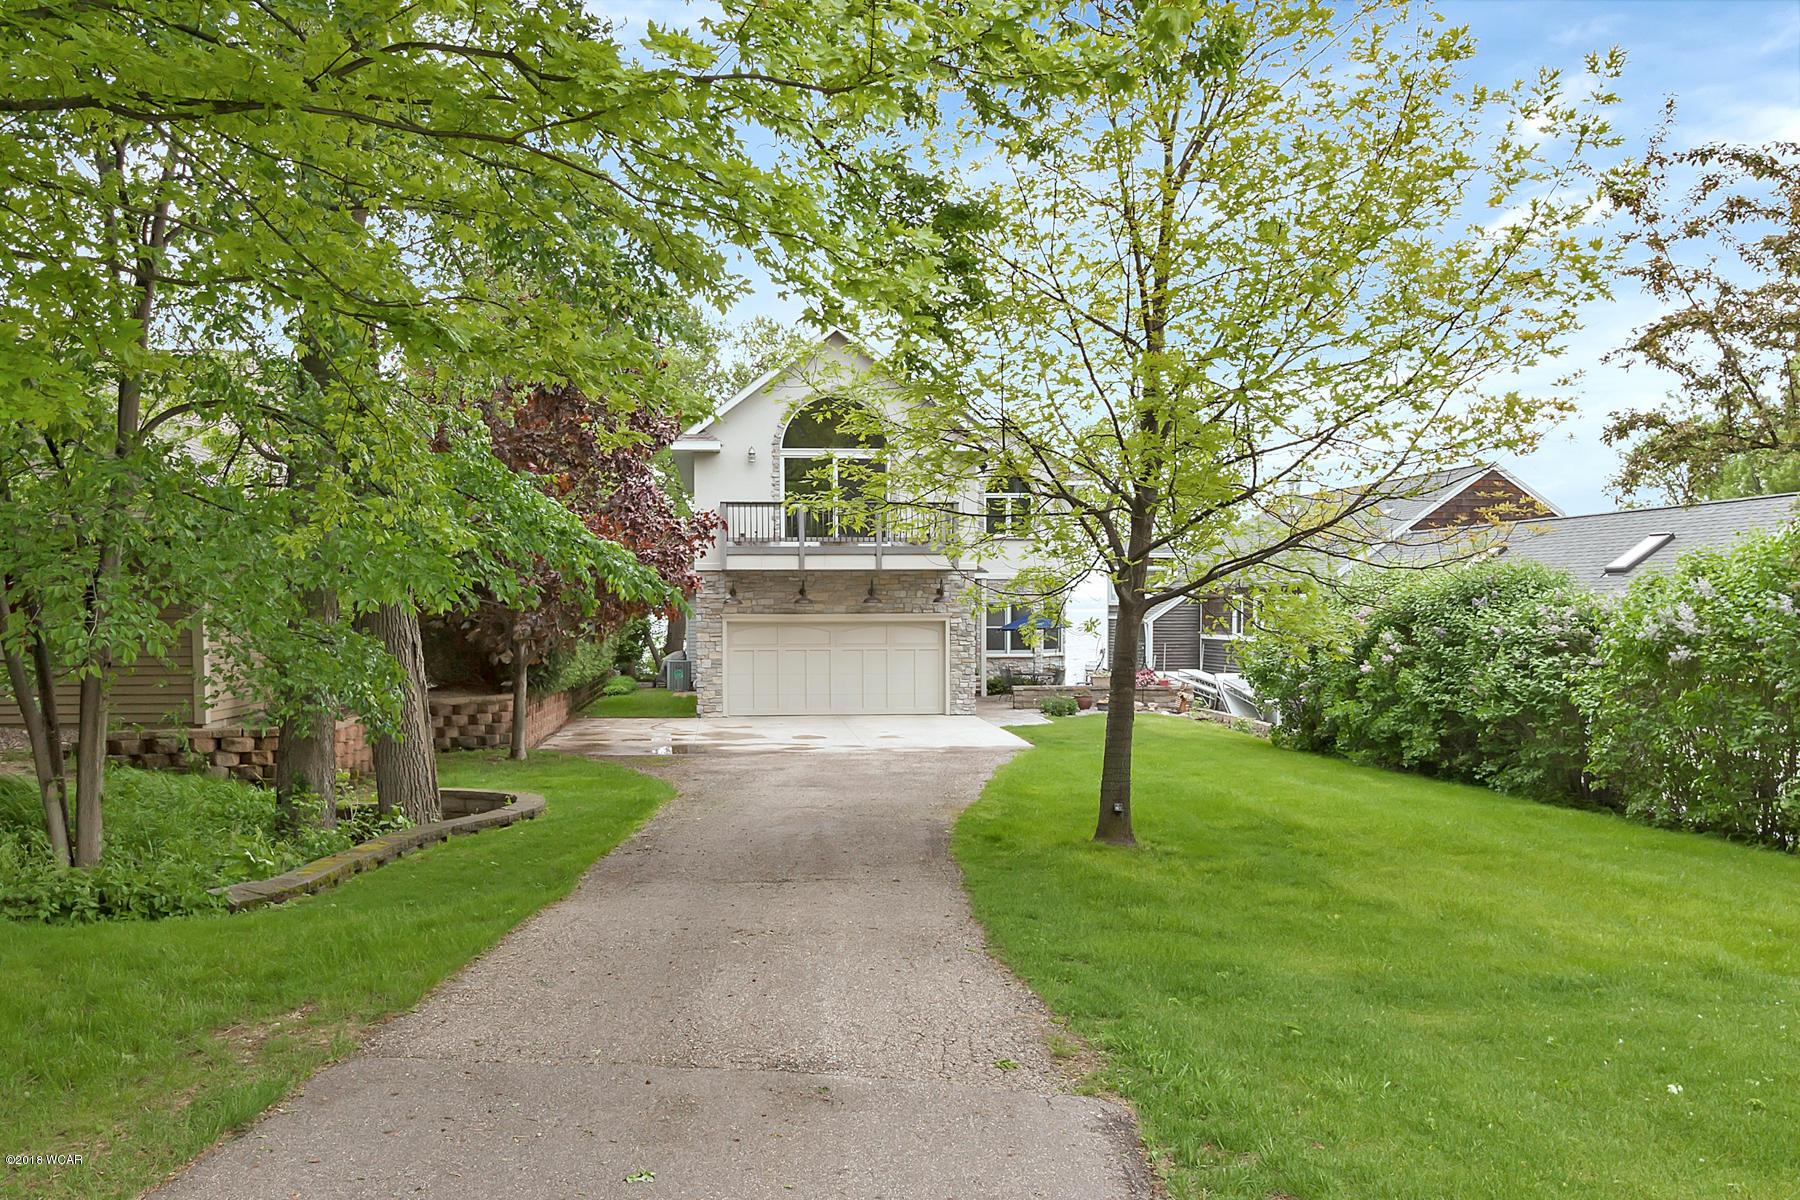 347 Lake Avenue,Spicer,5 Bedrooms Bedrooms,5 BathroomsBathrooms,Single Family,Lake Avenue,6030473